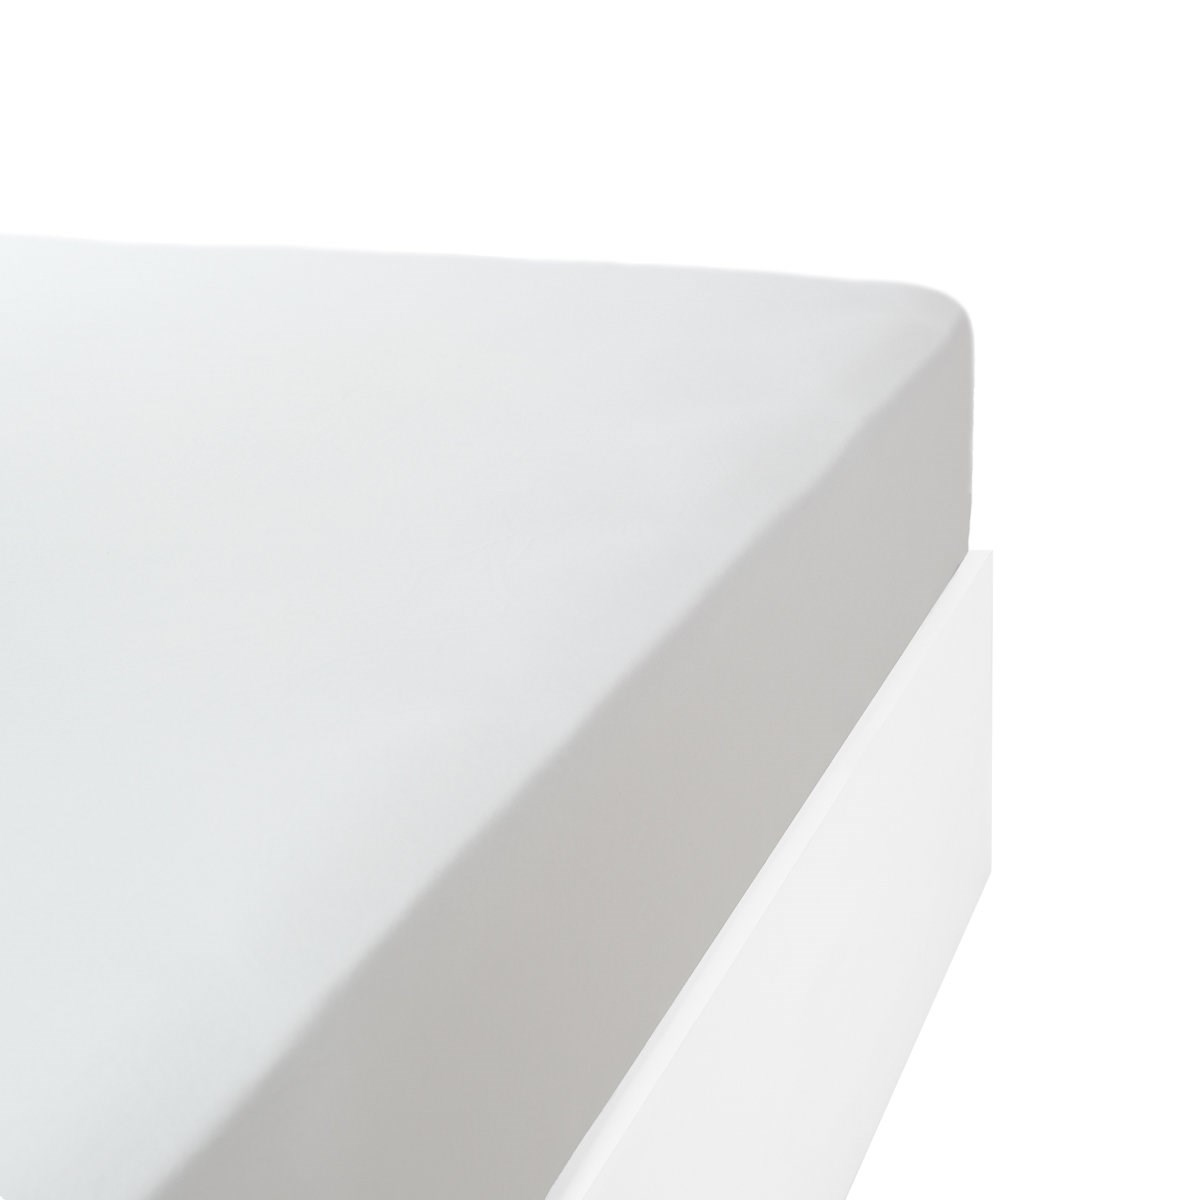 Drap housse jersey extensible en coton blanc 200x200 cm